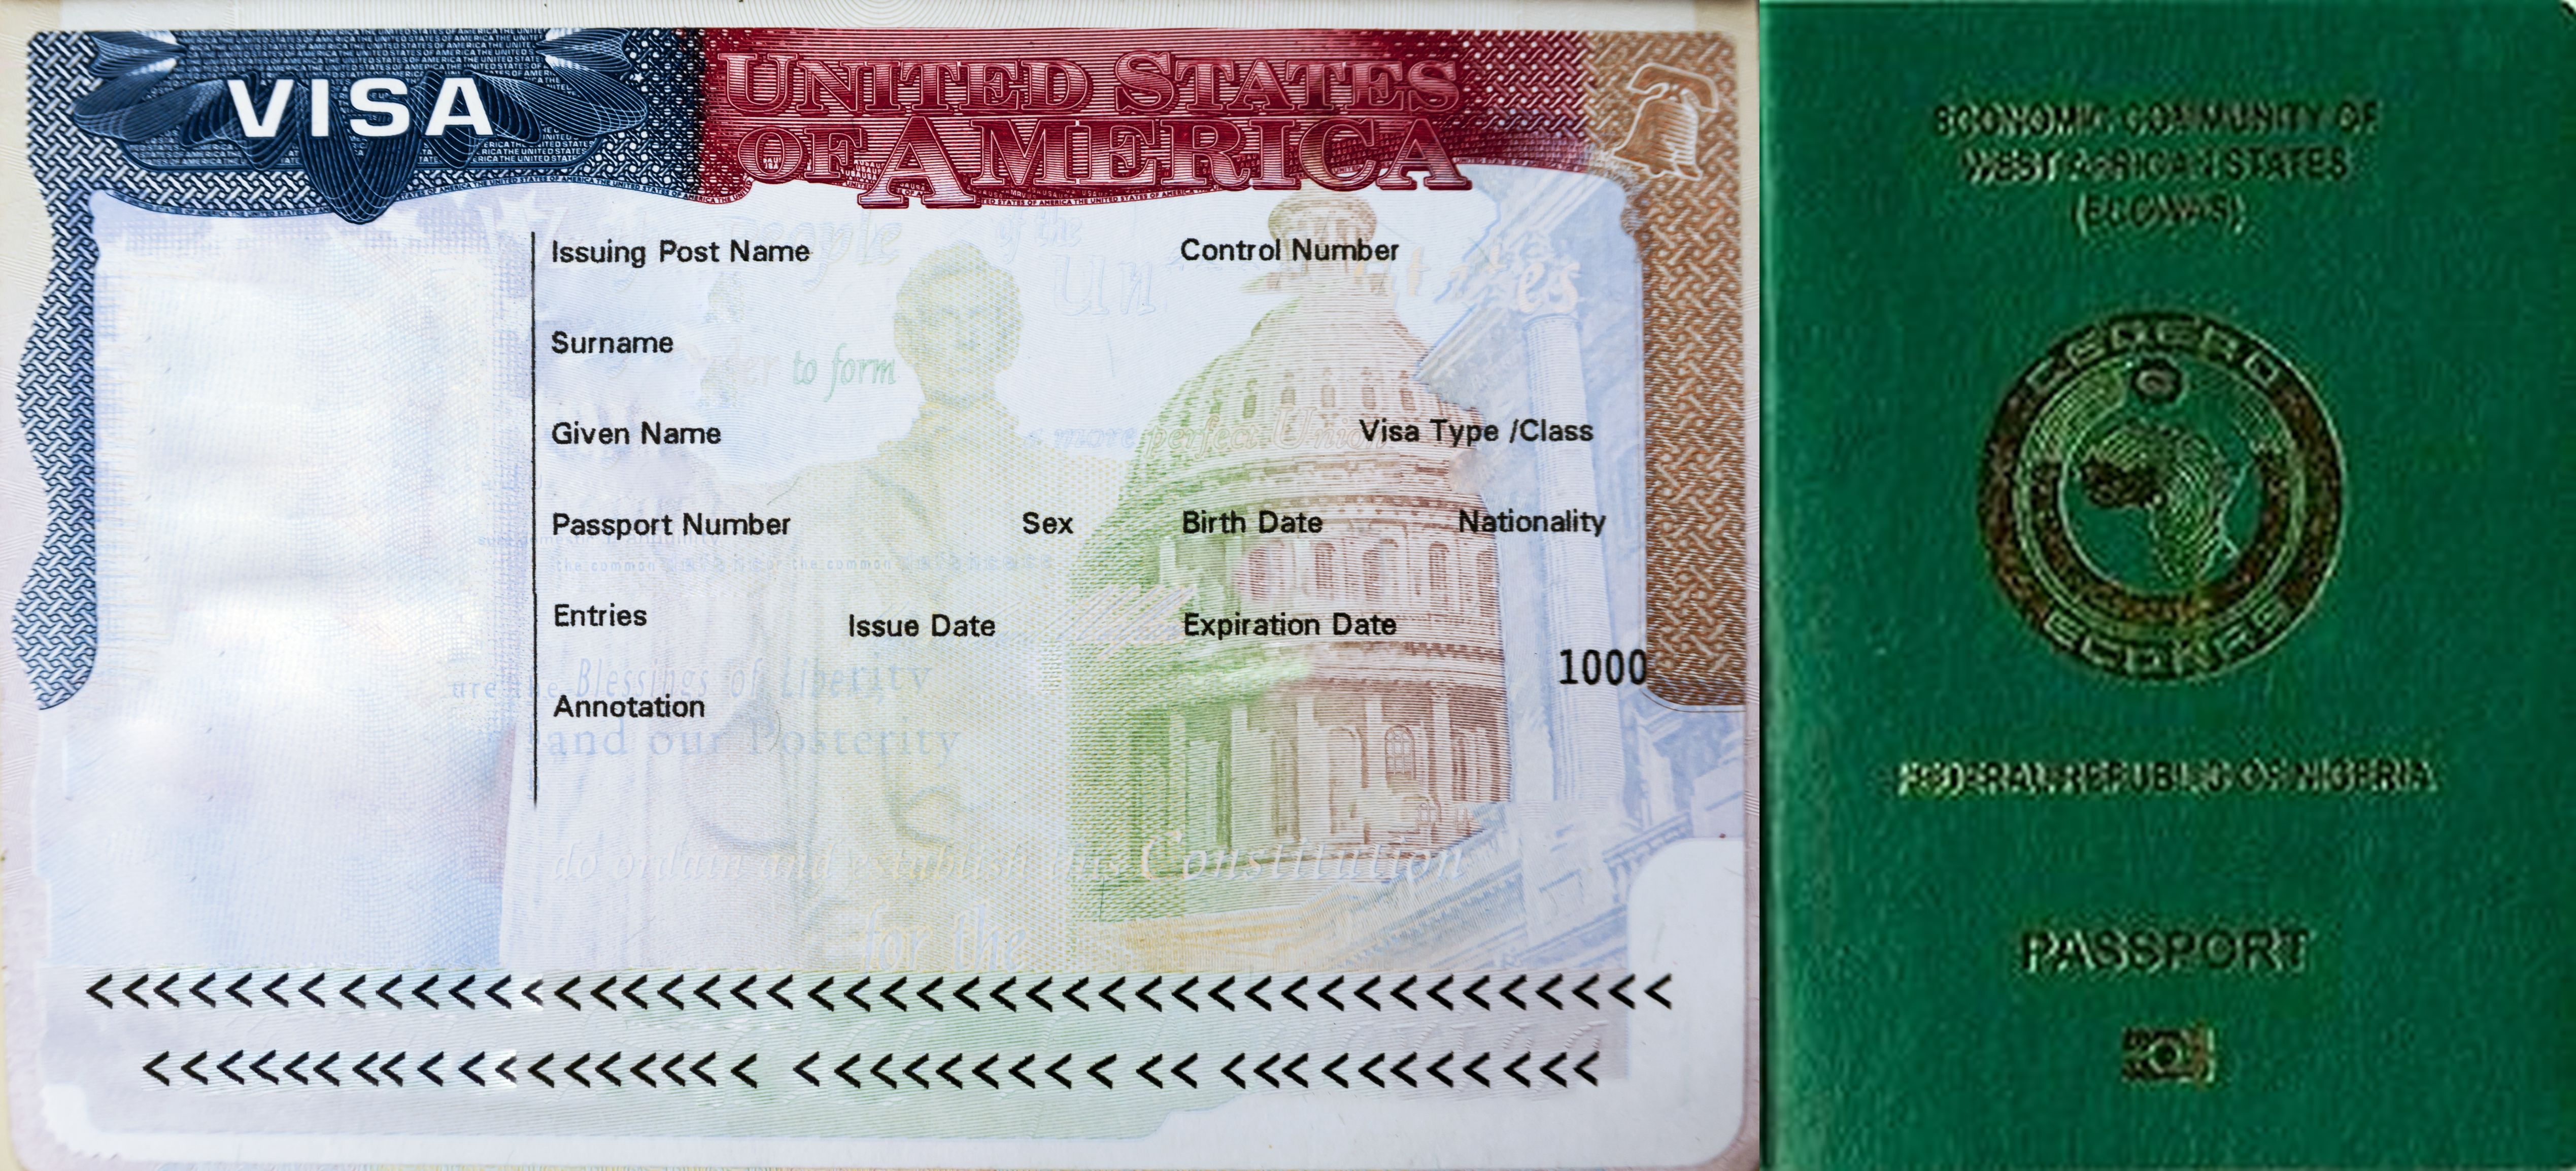 Drop Box visa applicants say U.S. is revoking and cancelling valid visas of Nigerians